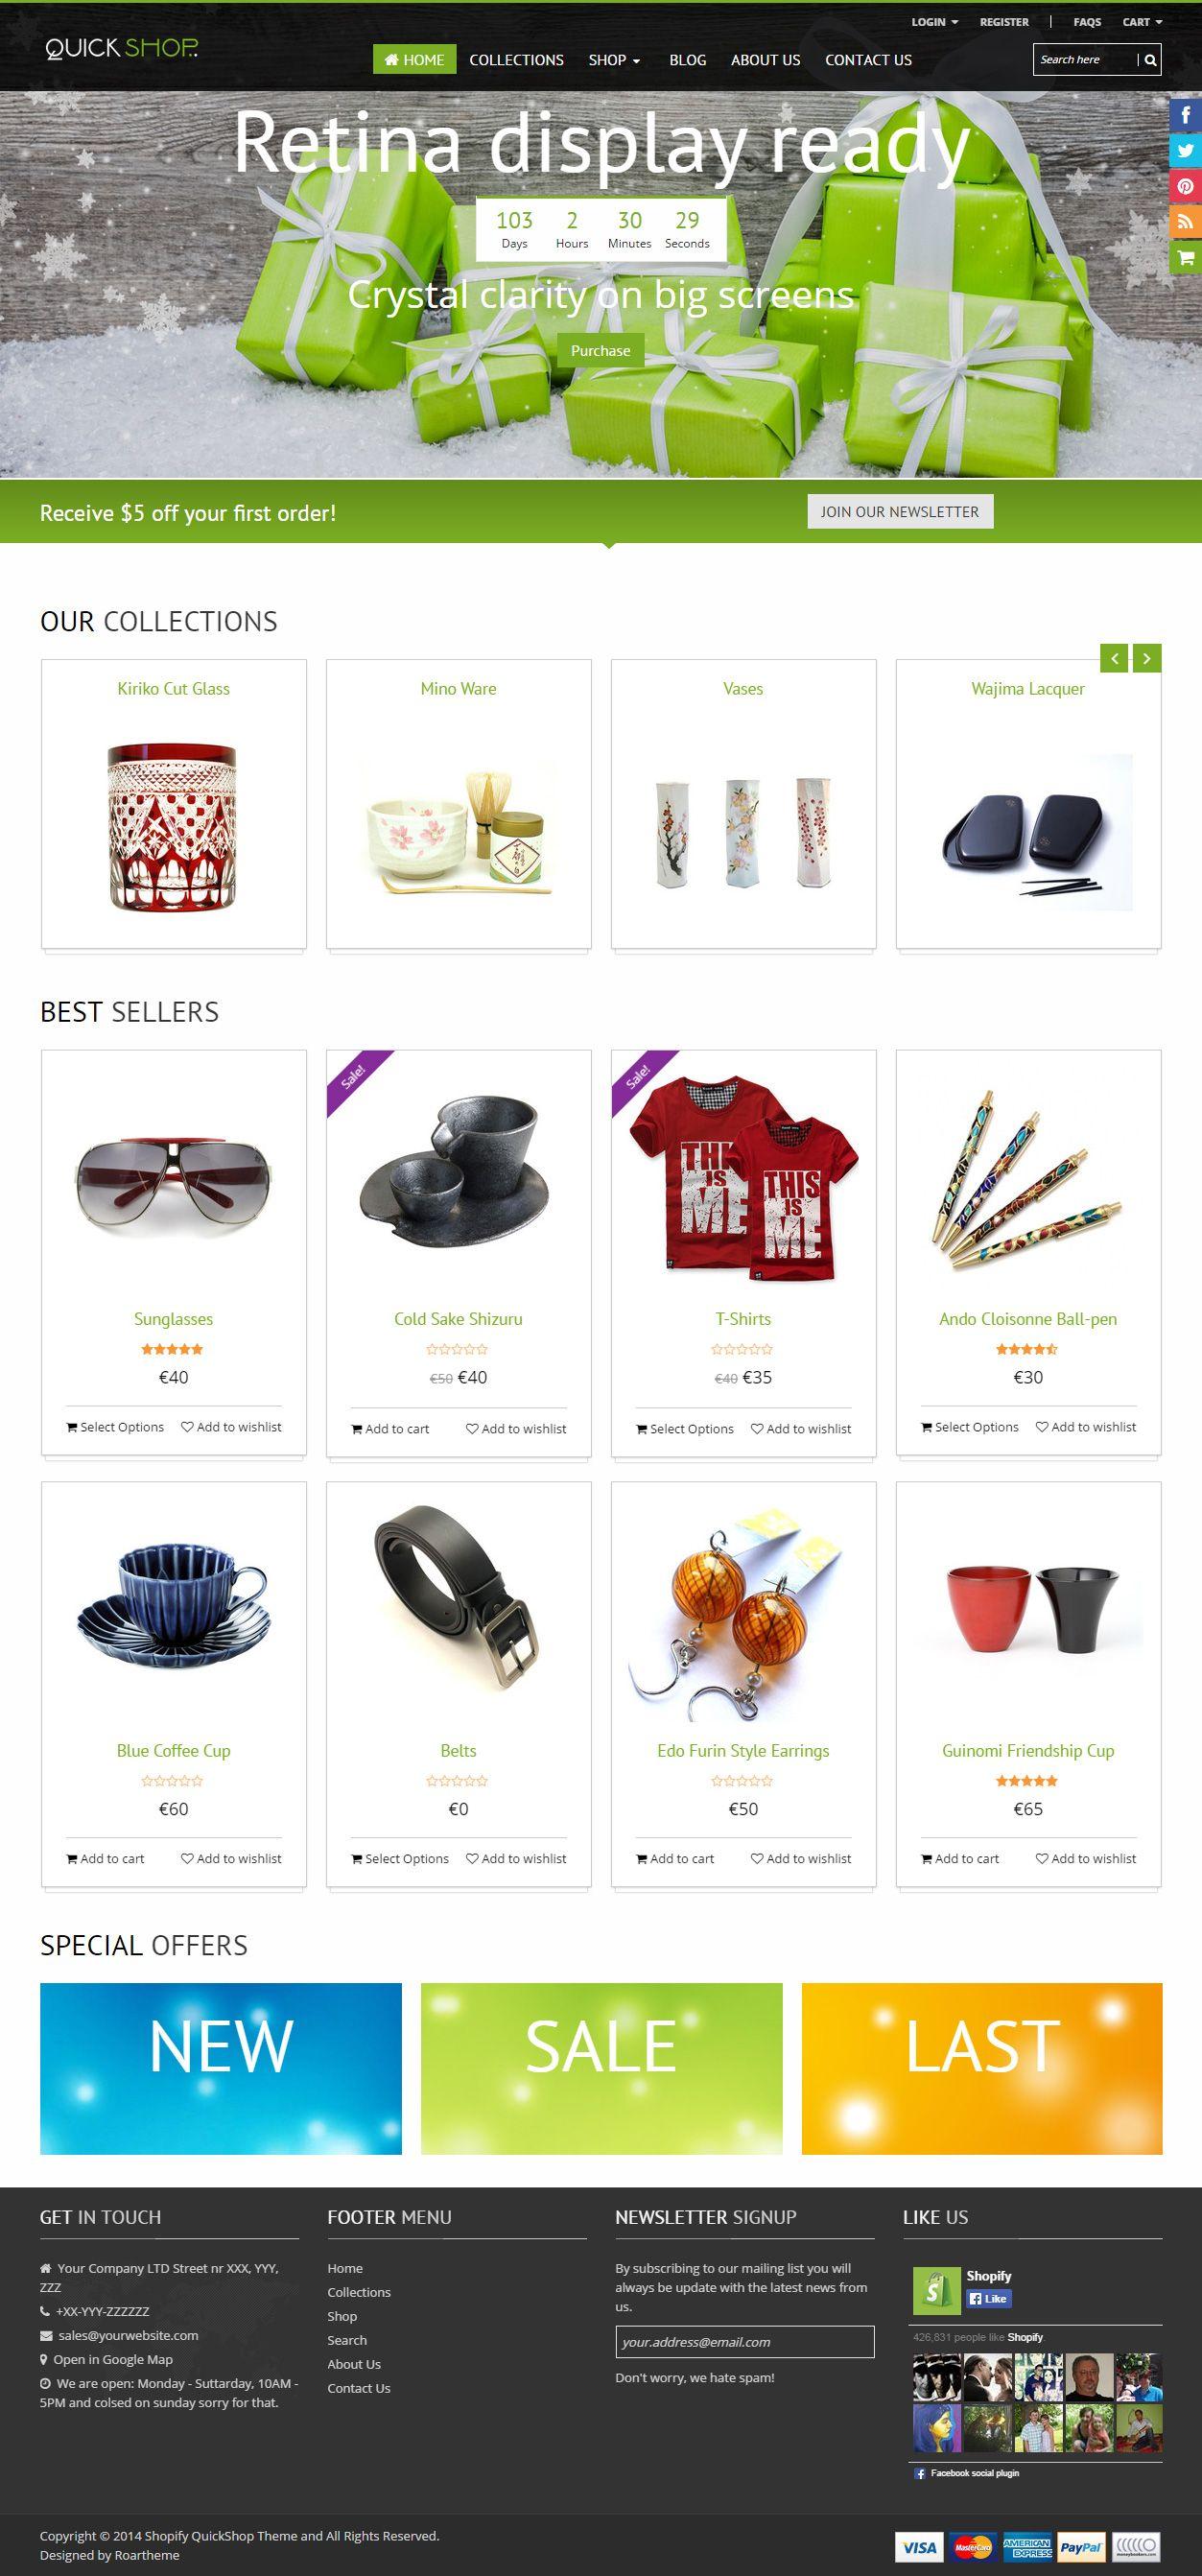 Quickshop is Premium full Responsive eCommerce Shopify Template. Retina Ready. Google Map. MailChimp. Bootstrap Framework. http://www.responsivemiracle.com/cms/quickshop-premium-responsive-shopify-theme/